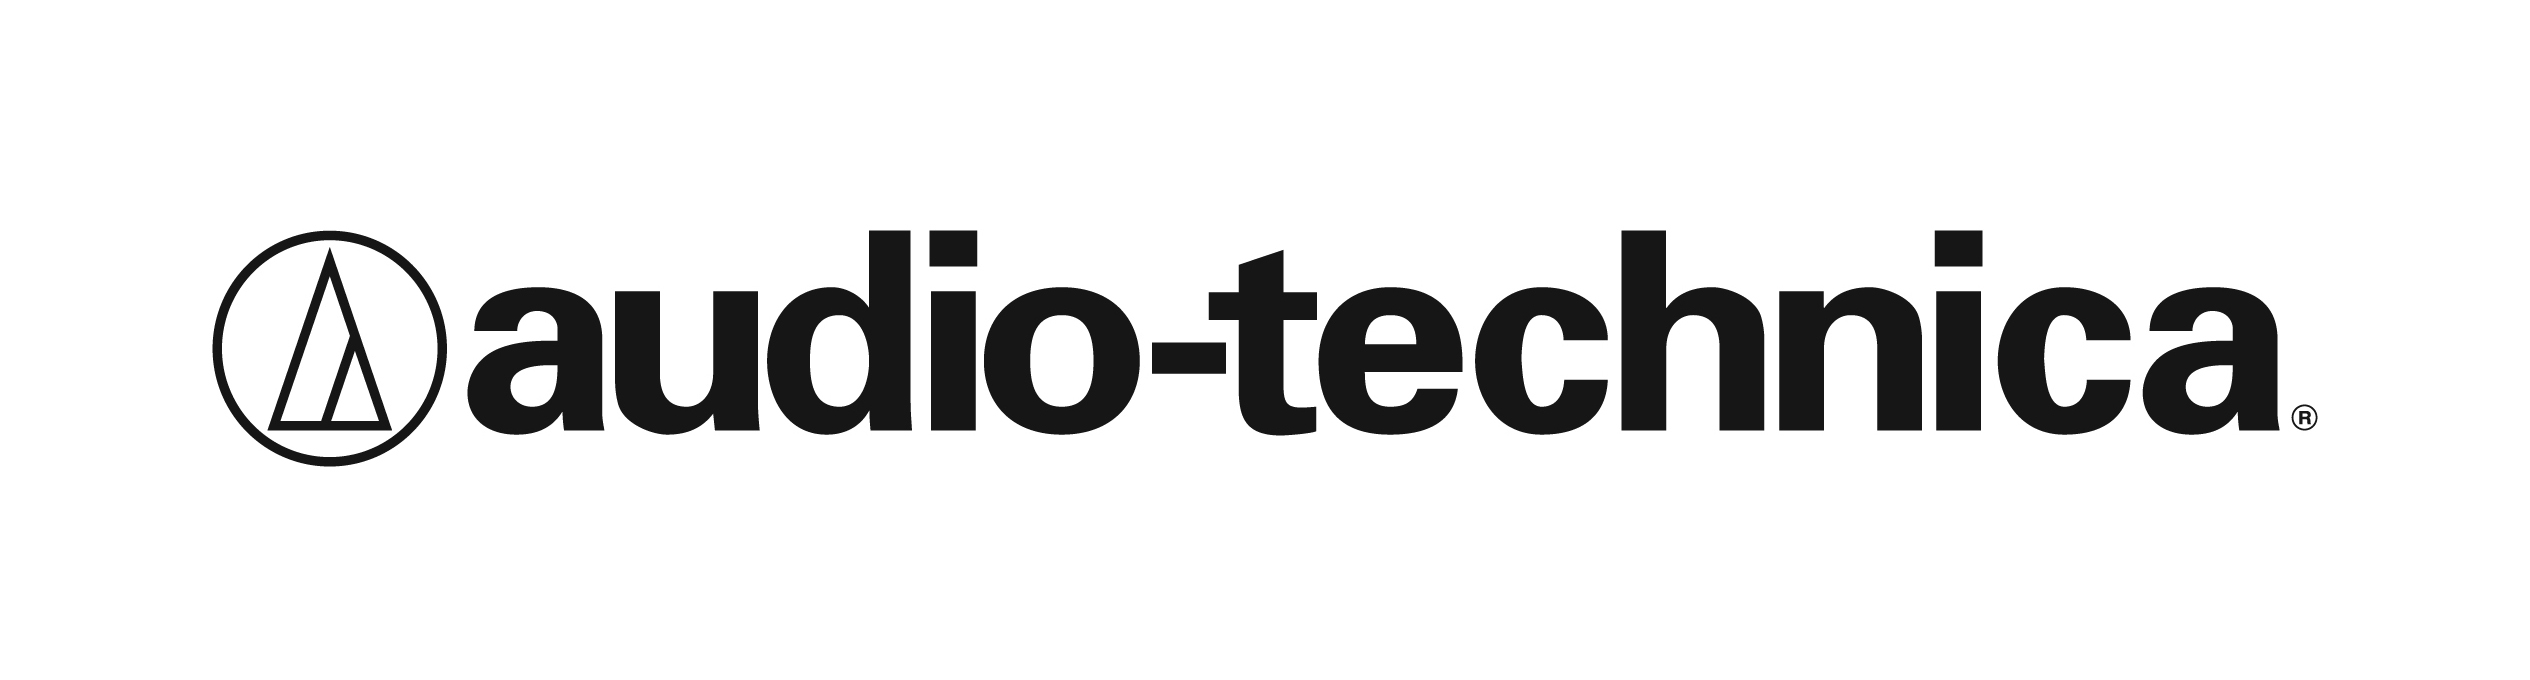 audiotechnica logo